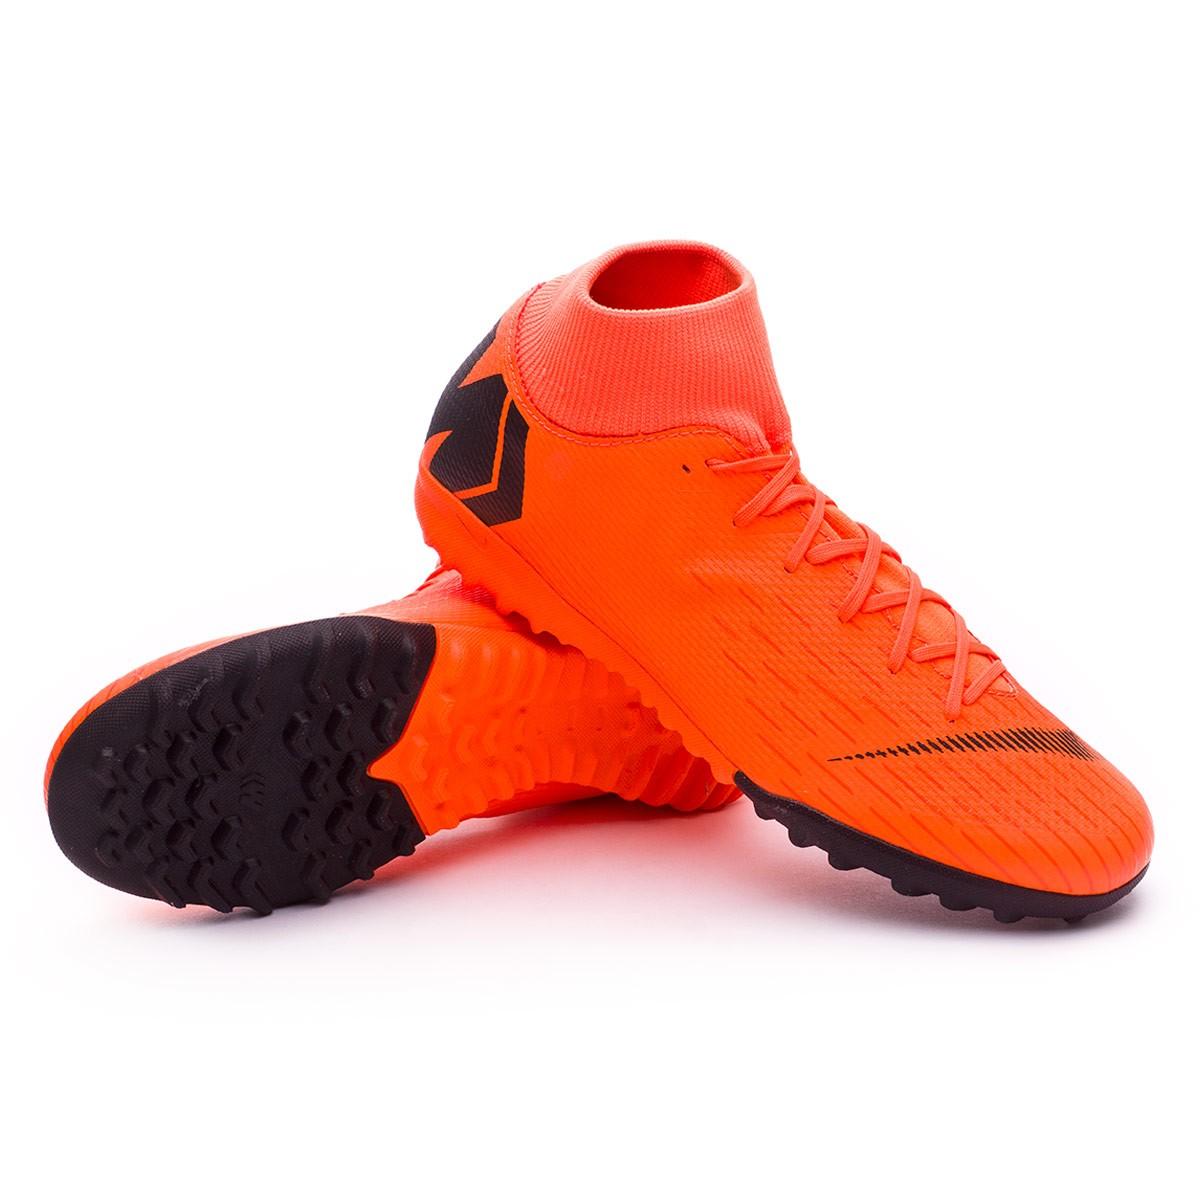 08b6ab9545 Tenis Nike Mercurial SuperflyX VI Academy Turf Total orange-Black-Volt -  Tienda de fútbol Fútbol Emotion